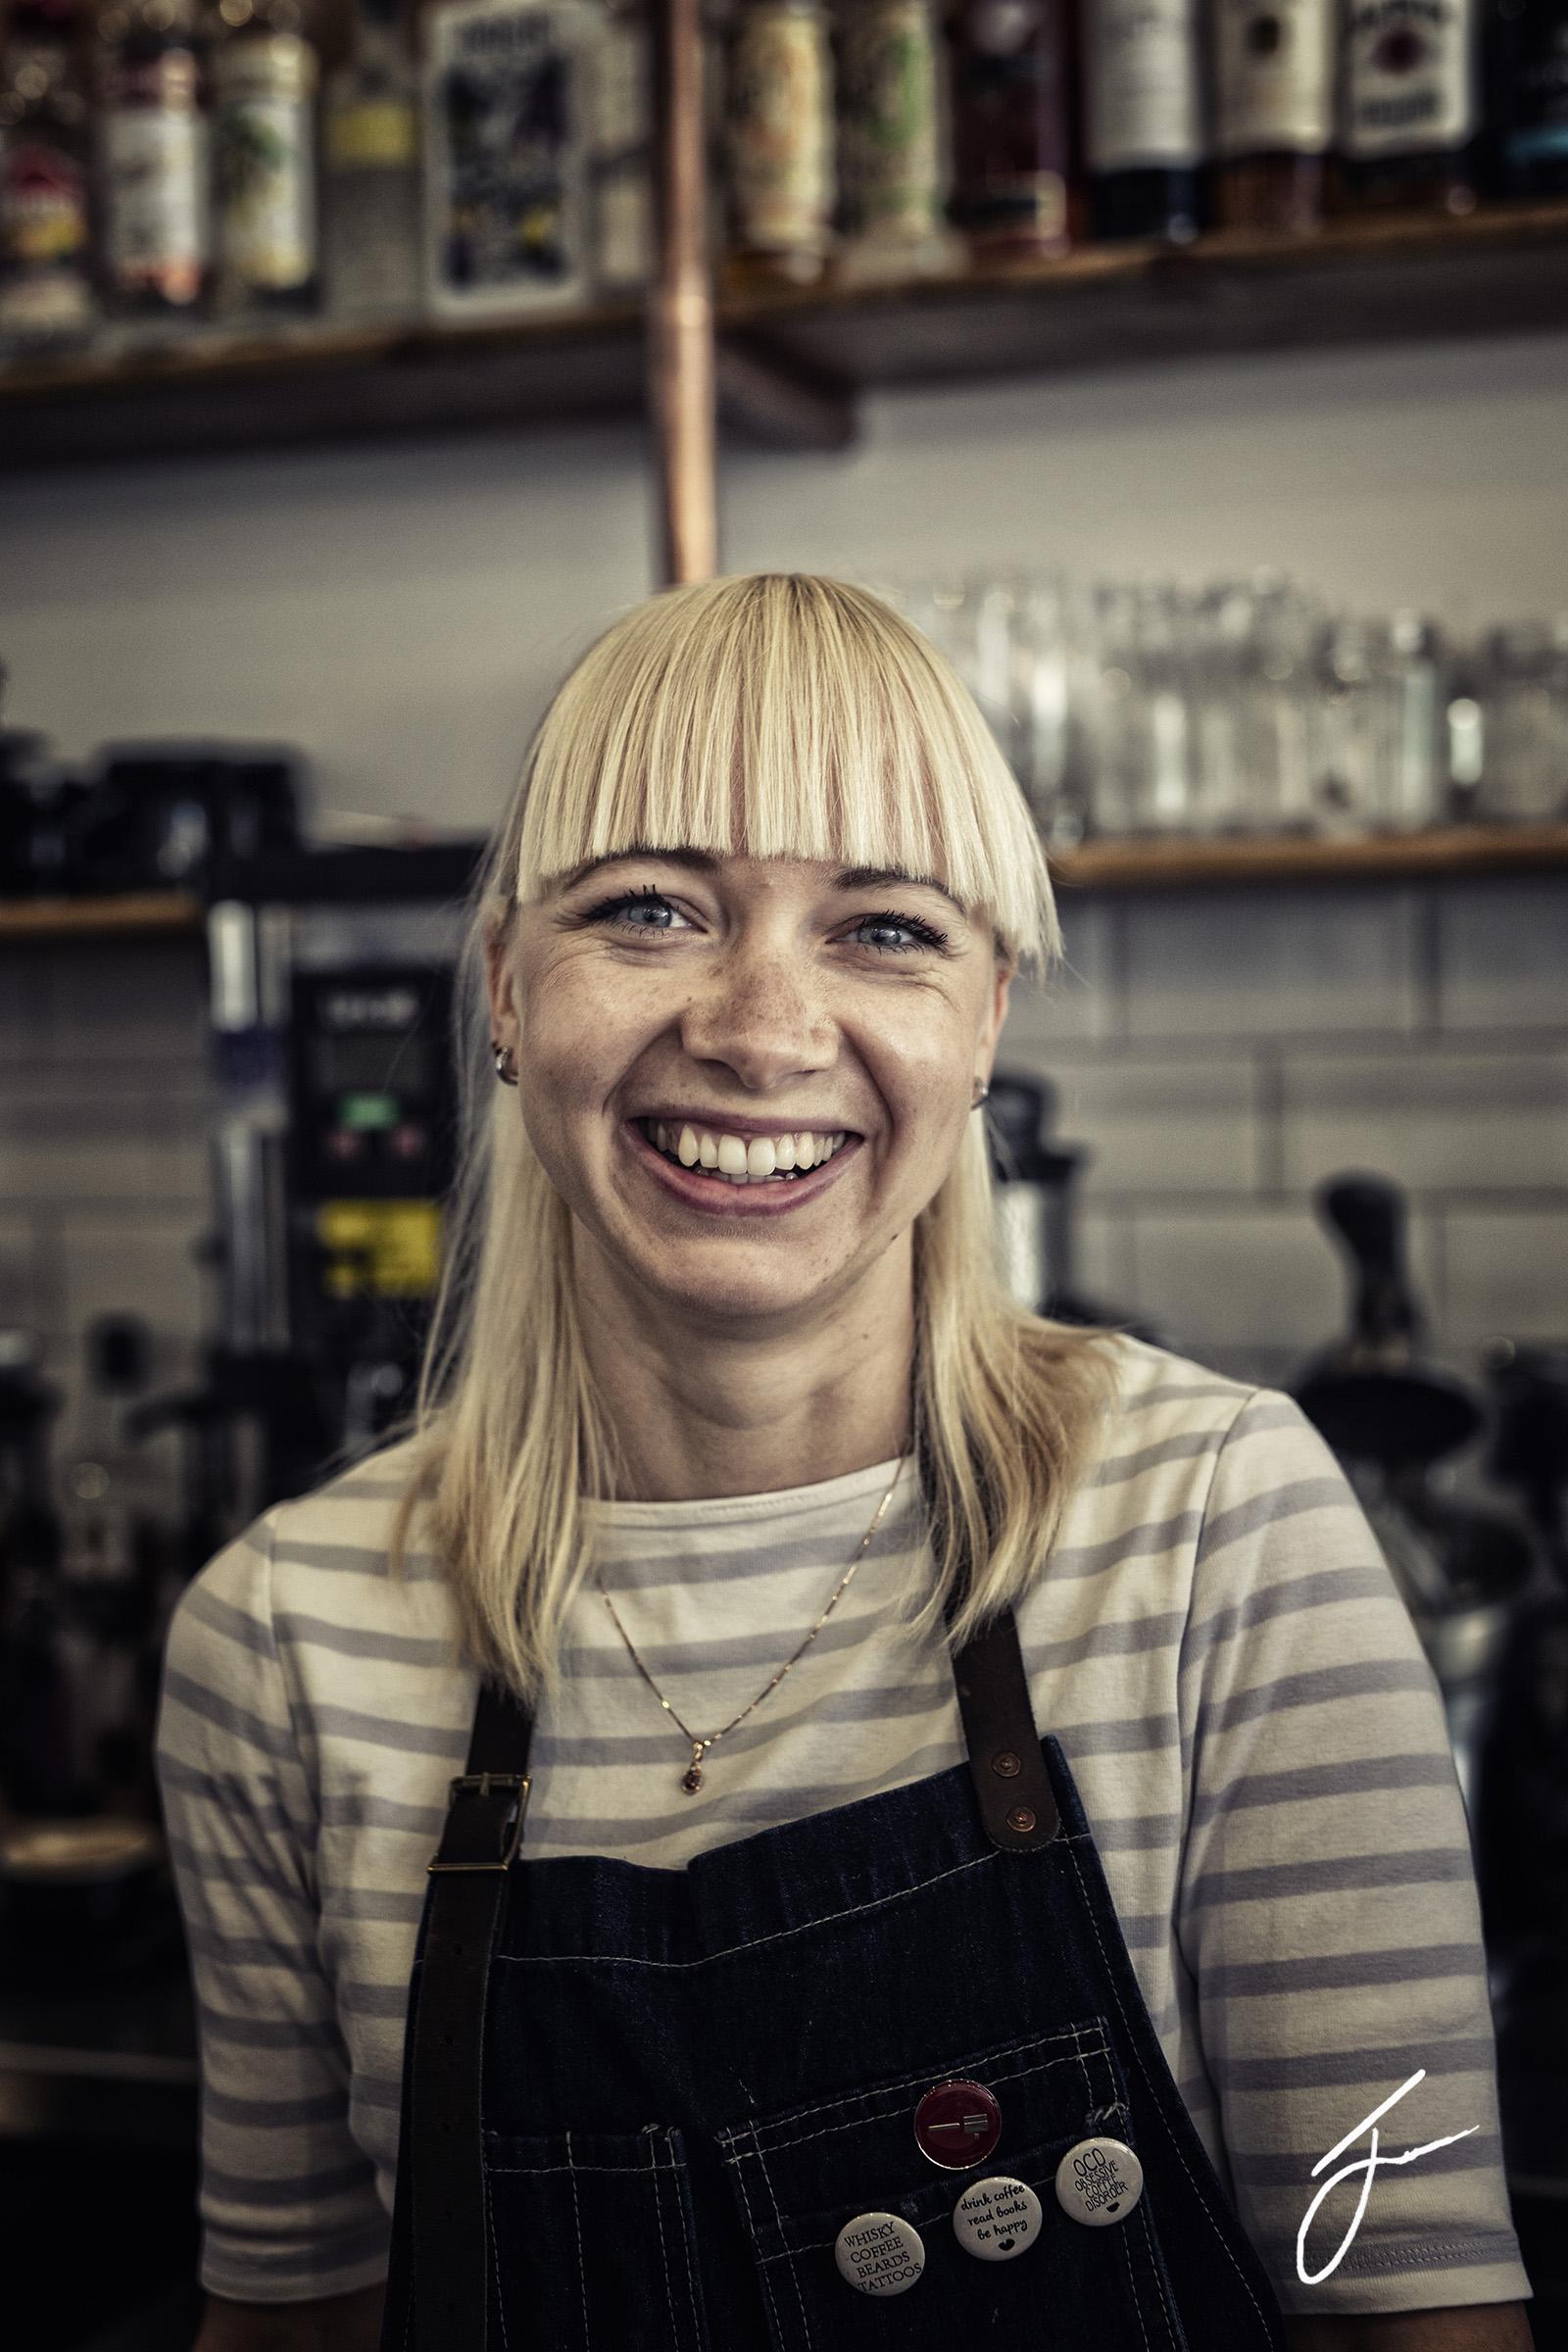 Lana, manager of The Calypso Coffee Company, Torquay. ©Julie Corcoran 2018